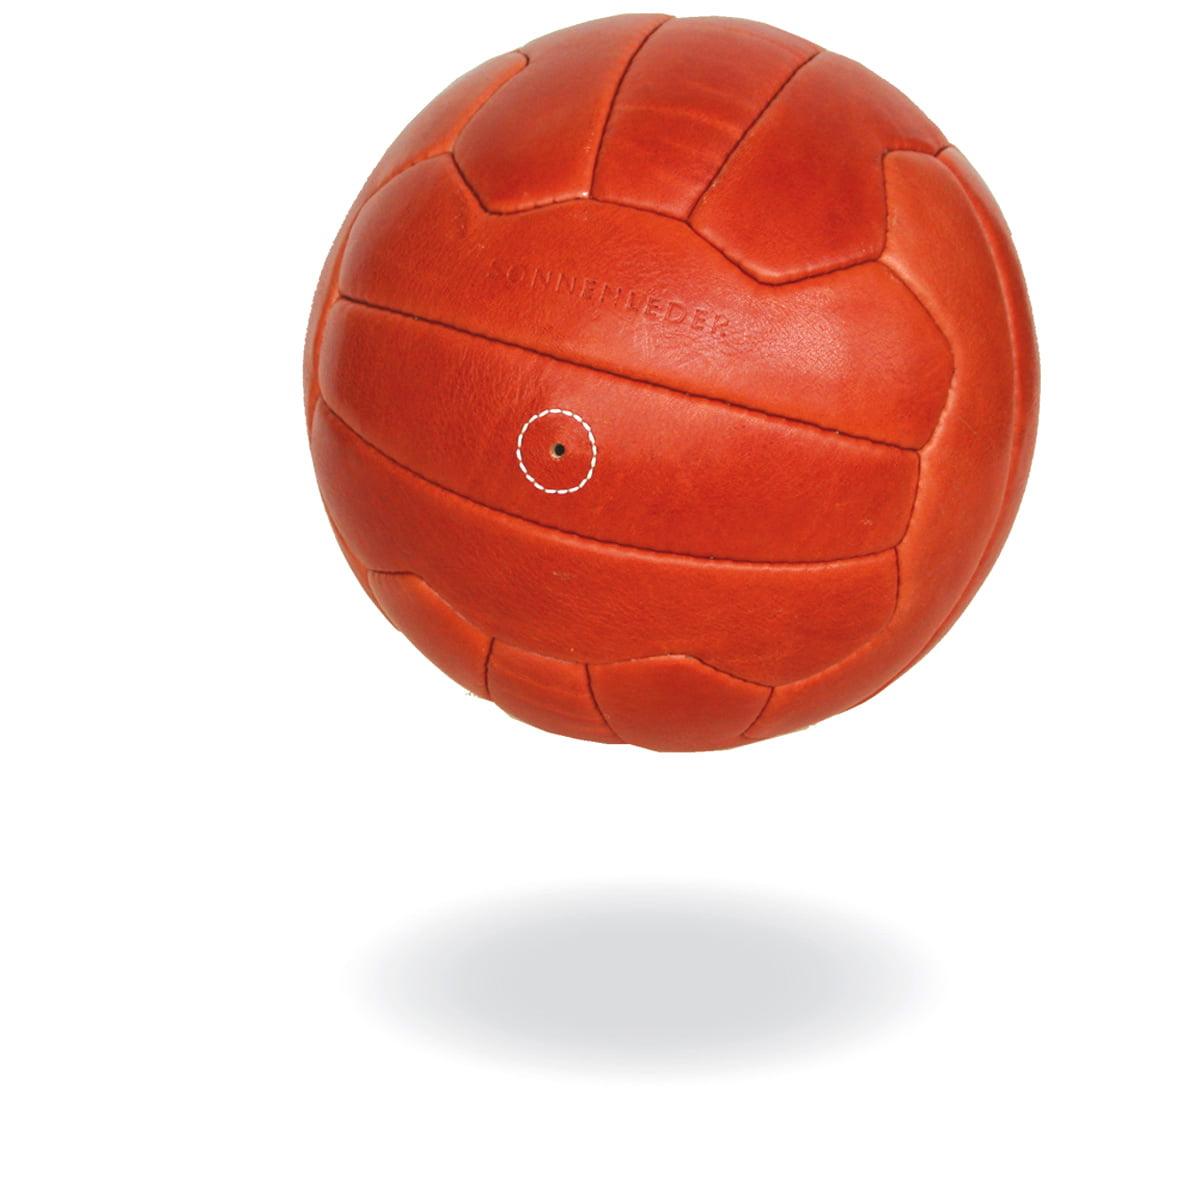 Torelli 54 Bern (N° 831 295) Fußball